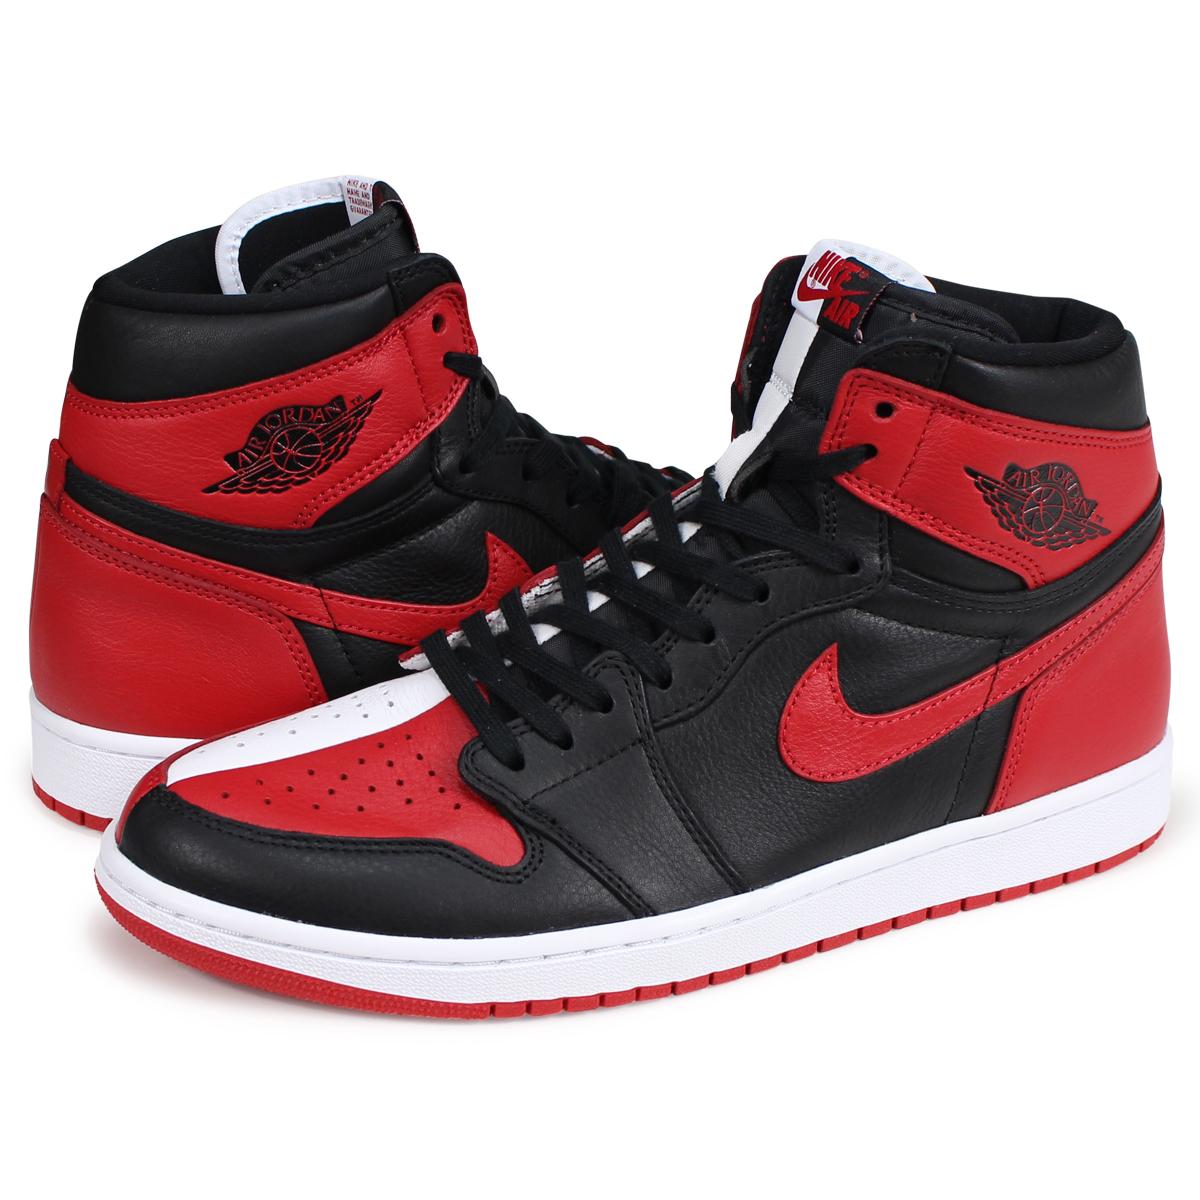 8c4732cb2a23 NIKE AIR JORDAN 1 RETRO HIGH OG HOMAGE TO HOME Nike Air Jordan 1 nostalgic  high men gap Dis sneakers 861